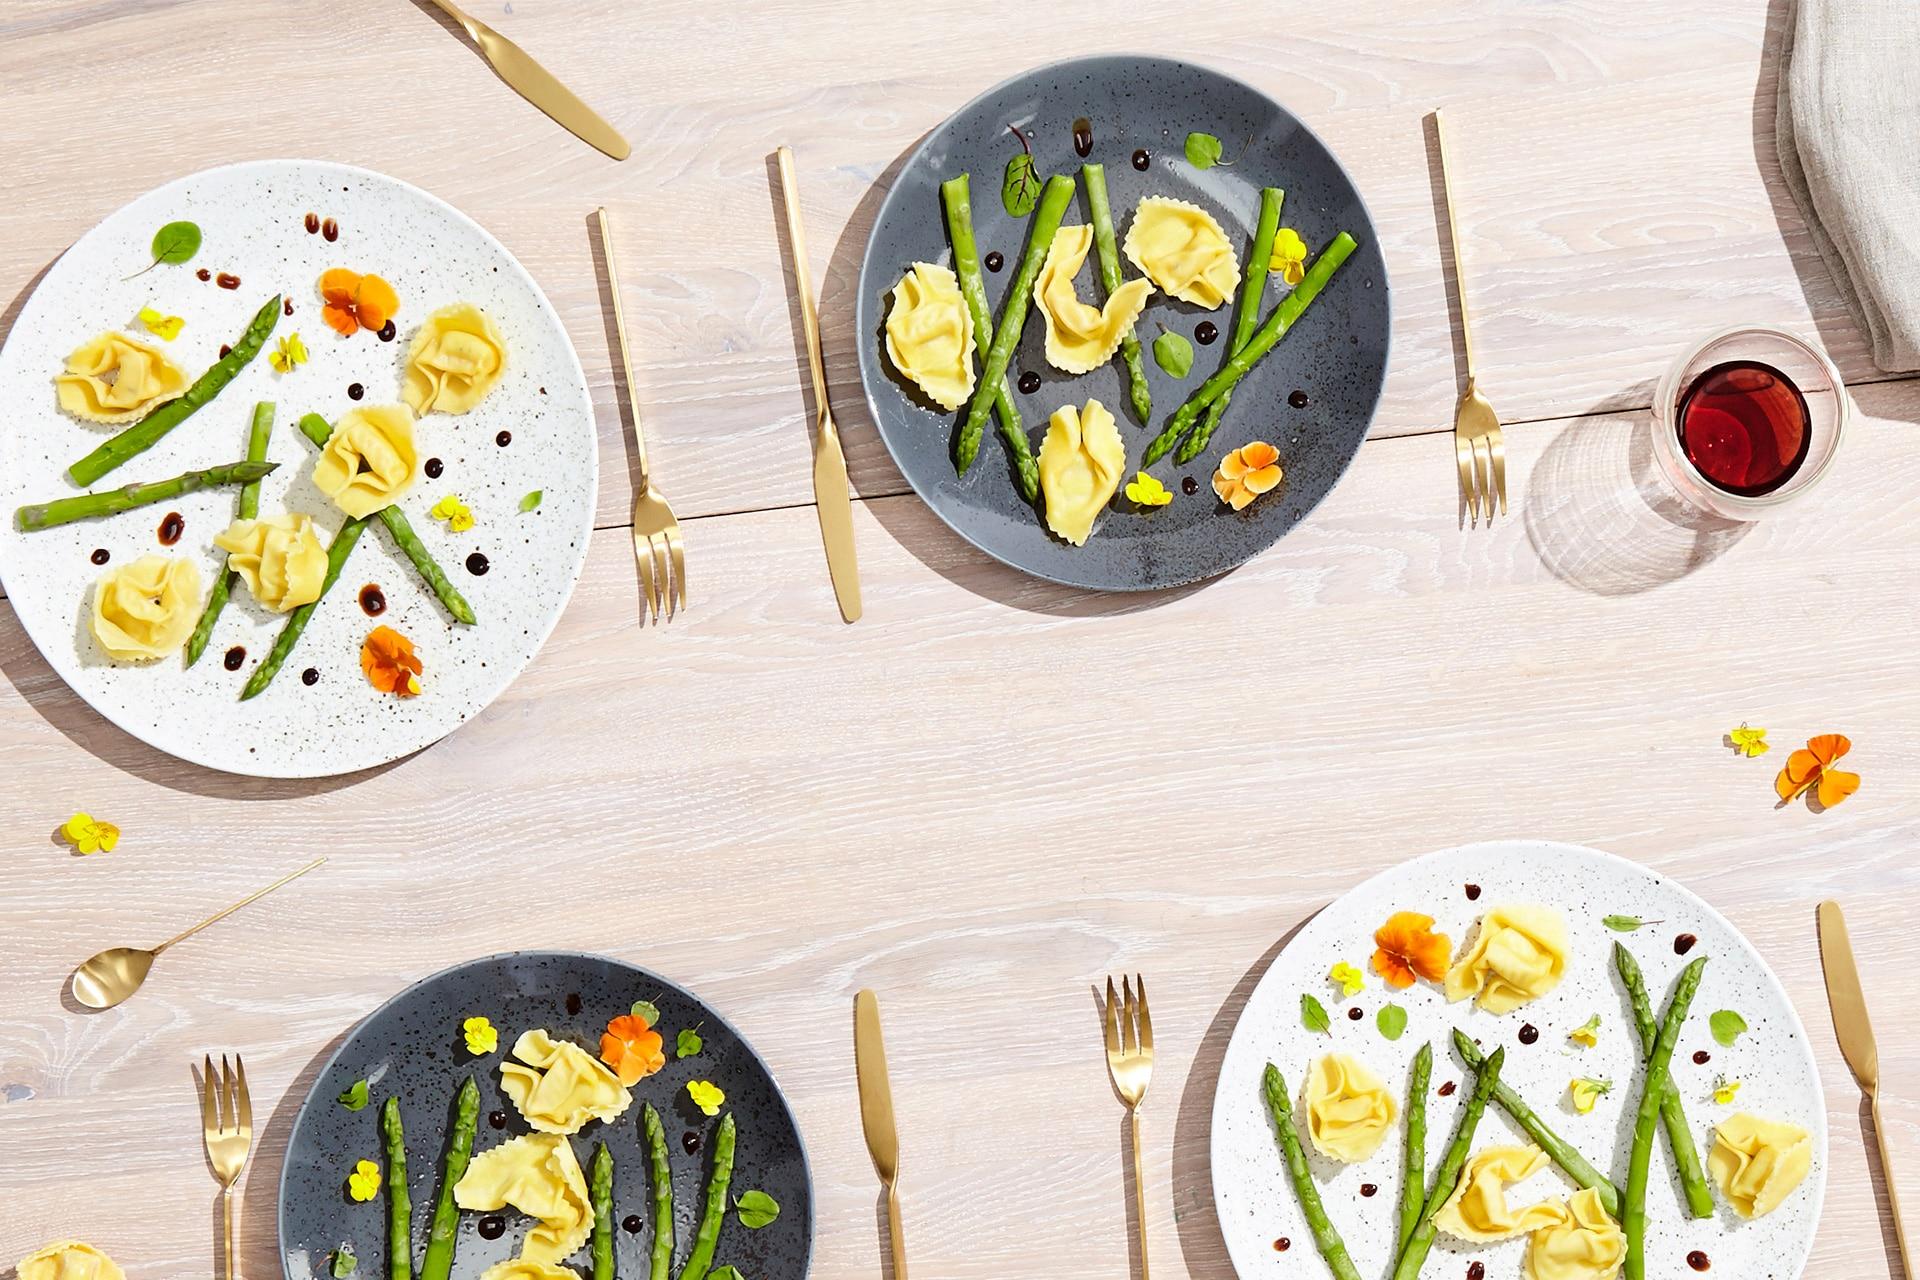 Malmo Design Cutlery - DESIGN BY MIGUEL SOEIRO